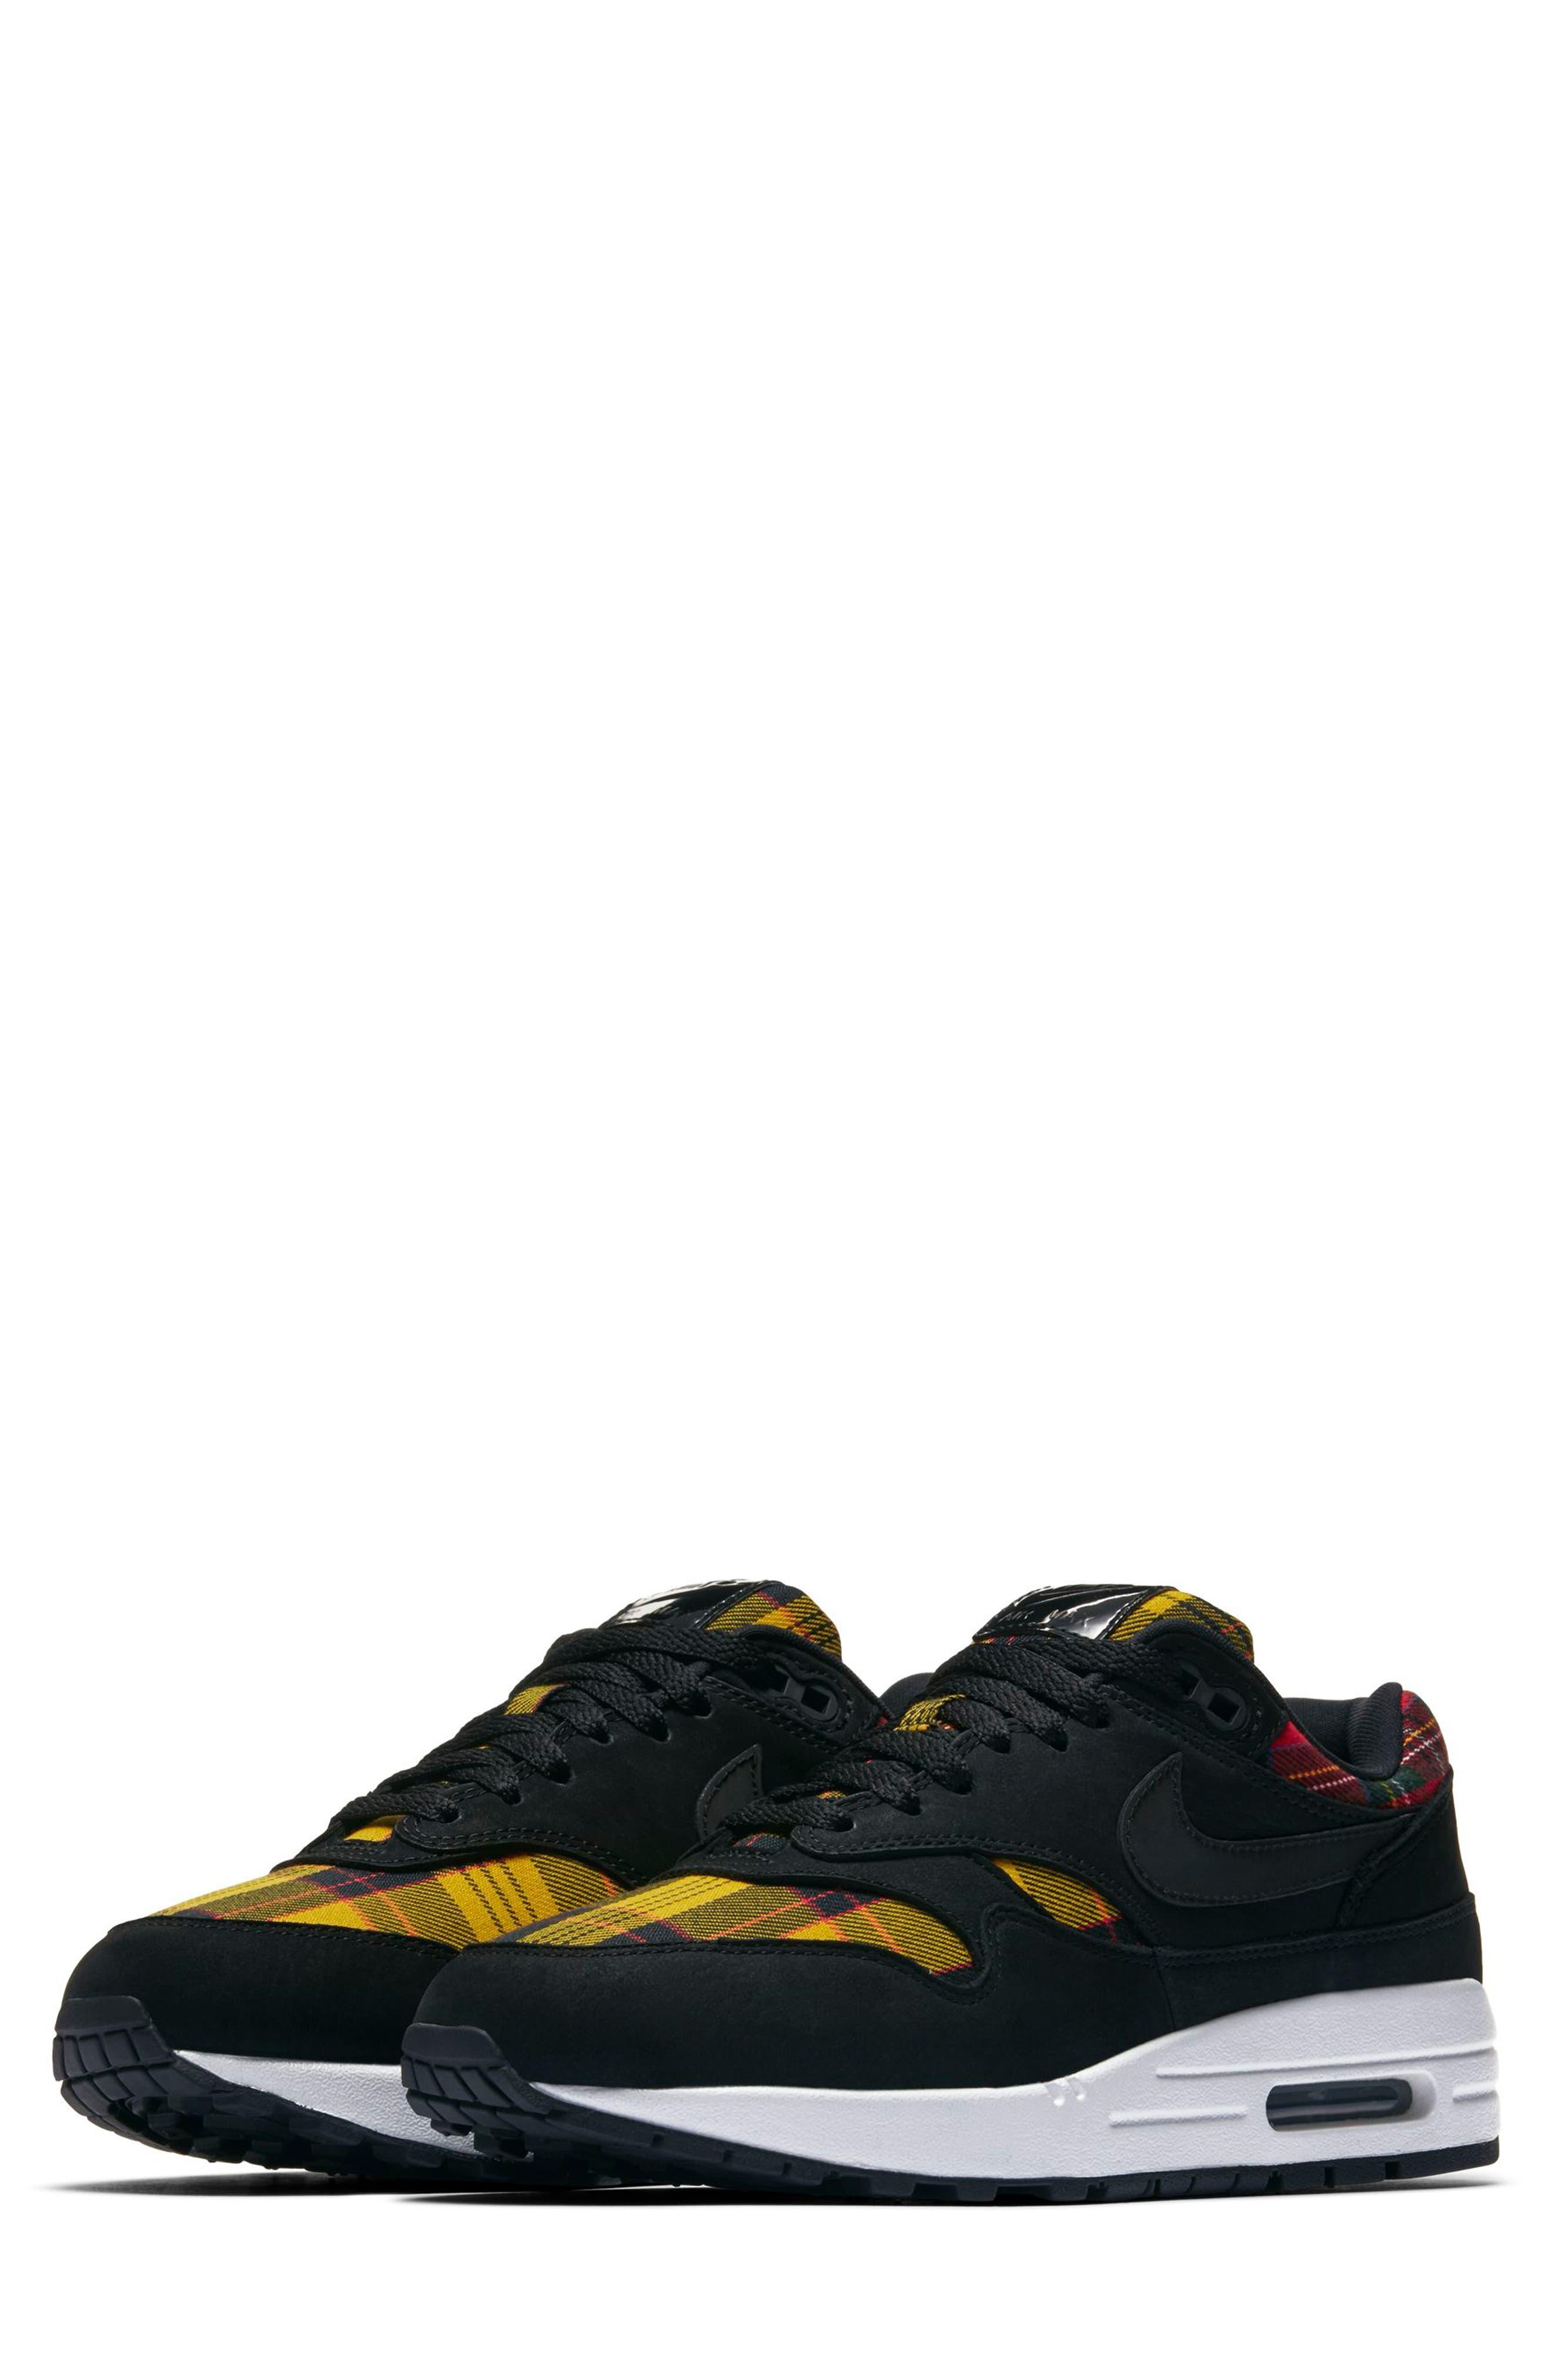 Air Max 1 SE Sneaker,                             Main thumbnail 1, color,                             BLACK/ BLACK/ UNIVERSITY RED